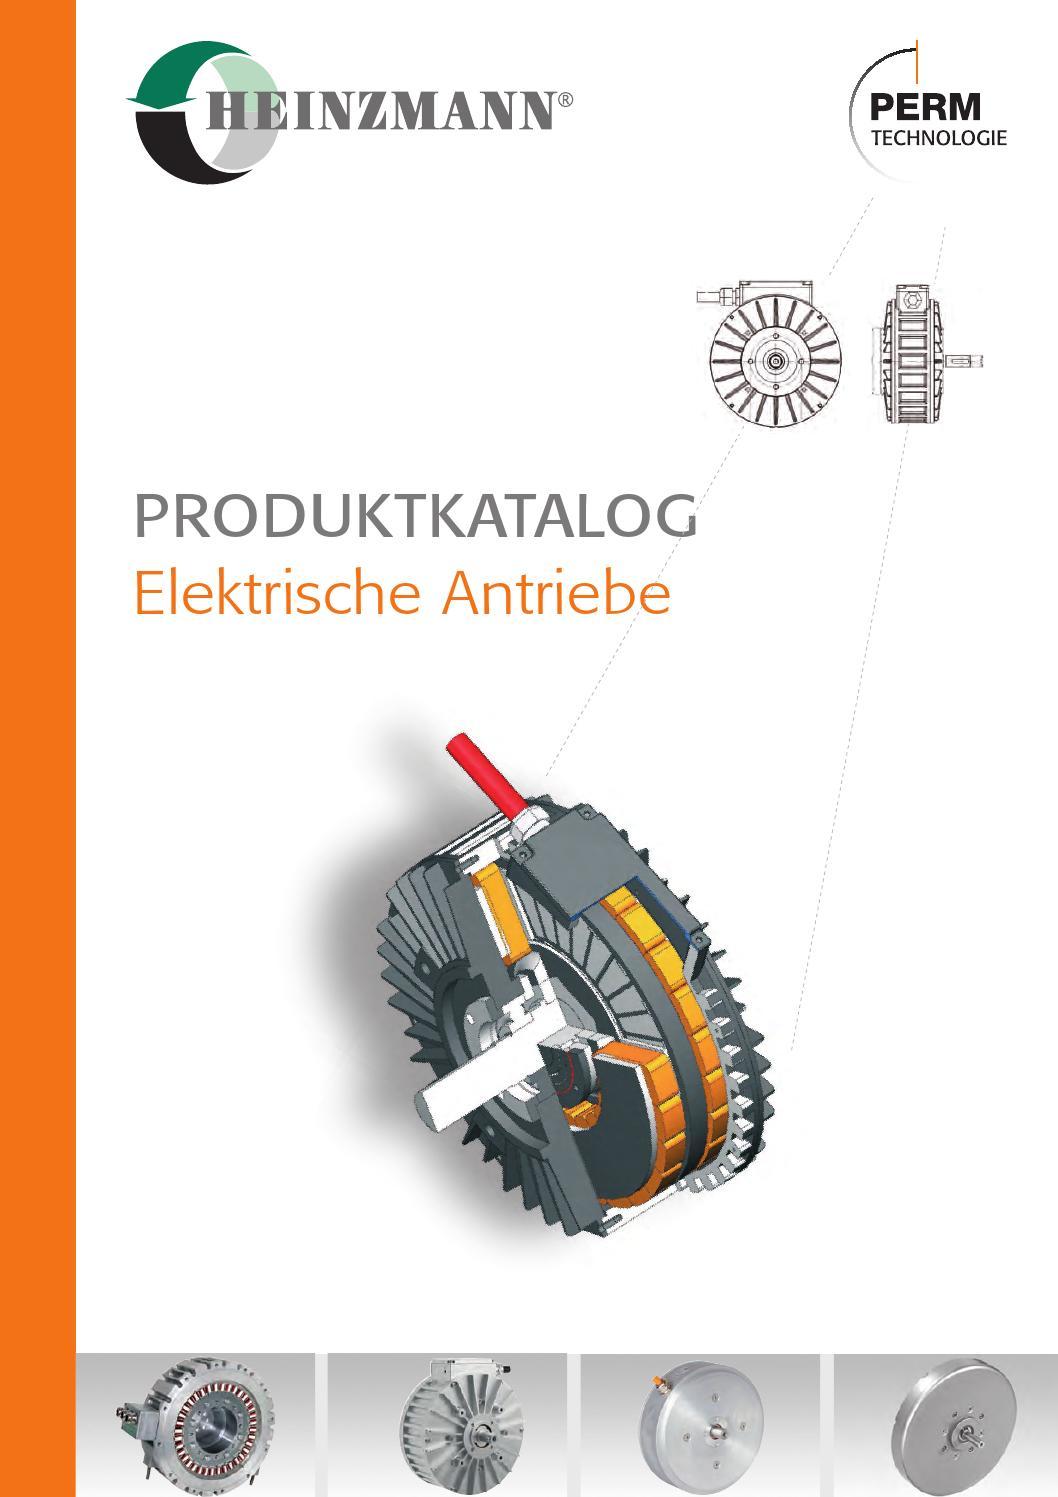 HEINZMANN Elektromotoren [Katalog] by Heinzmann GmbH & Co. KG - issuu